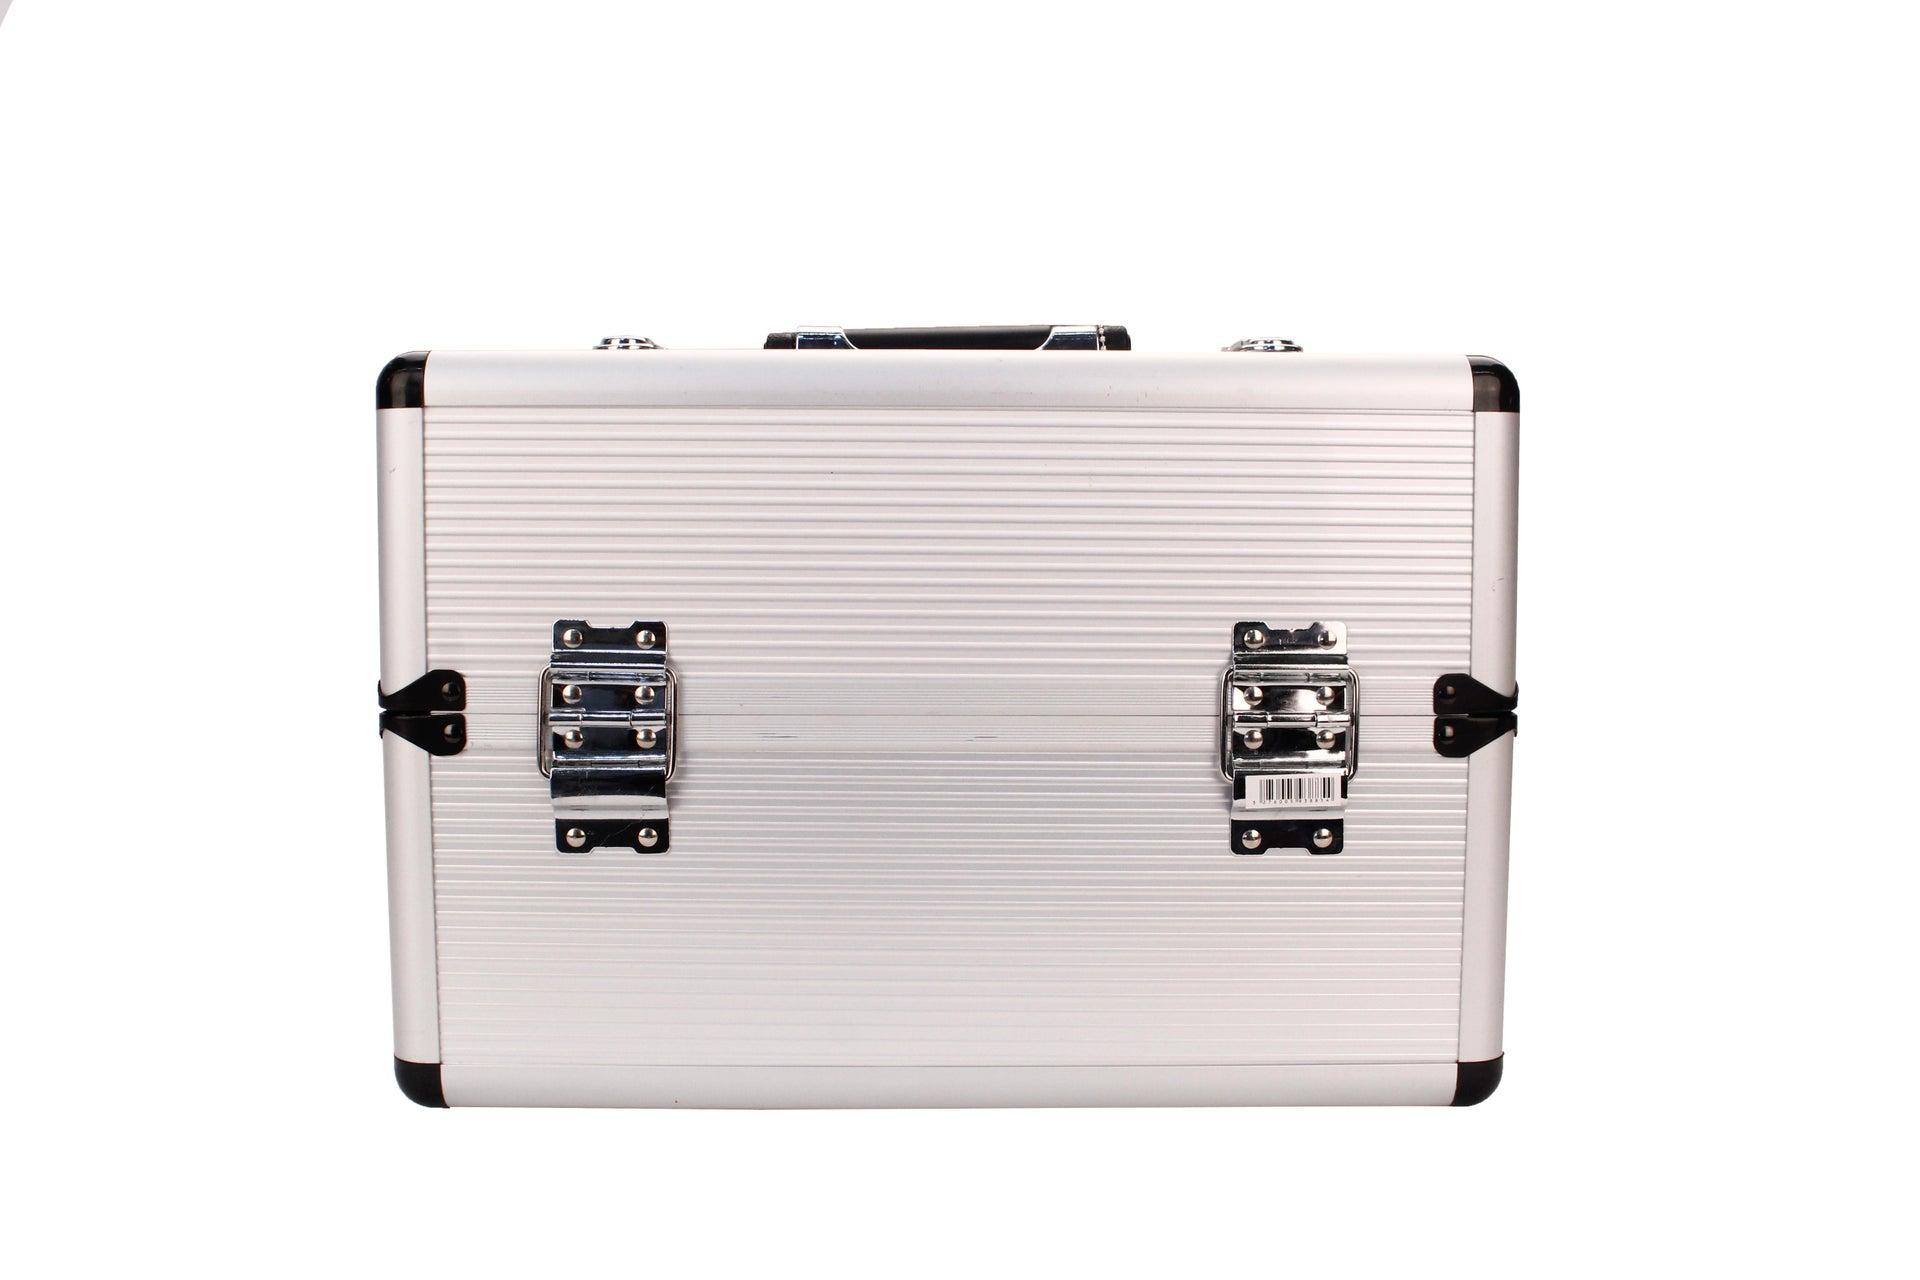 Cassetta attrezzi DEXTER L 22.5 x H 36.5 cm, profondità 250 mm - 2